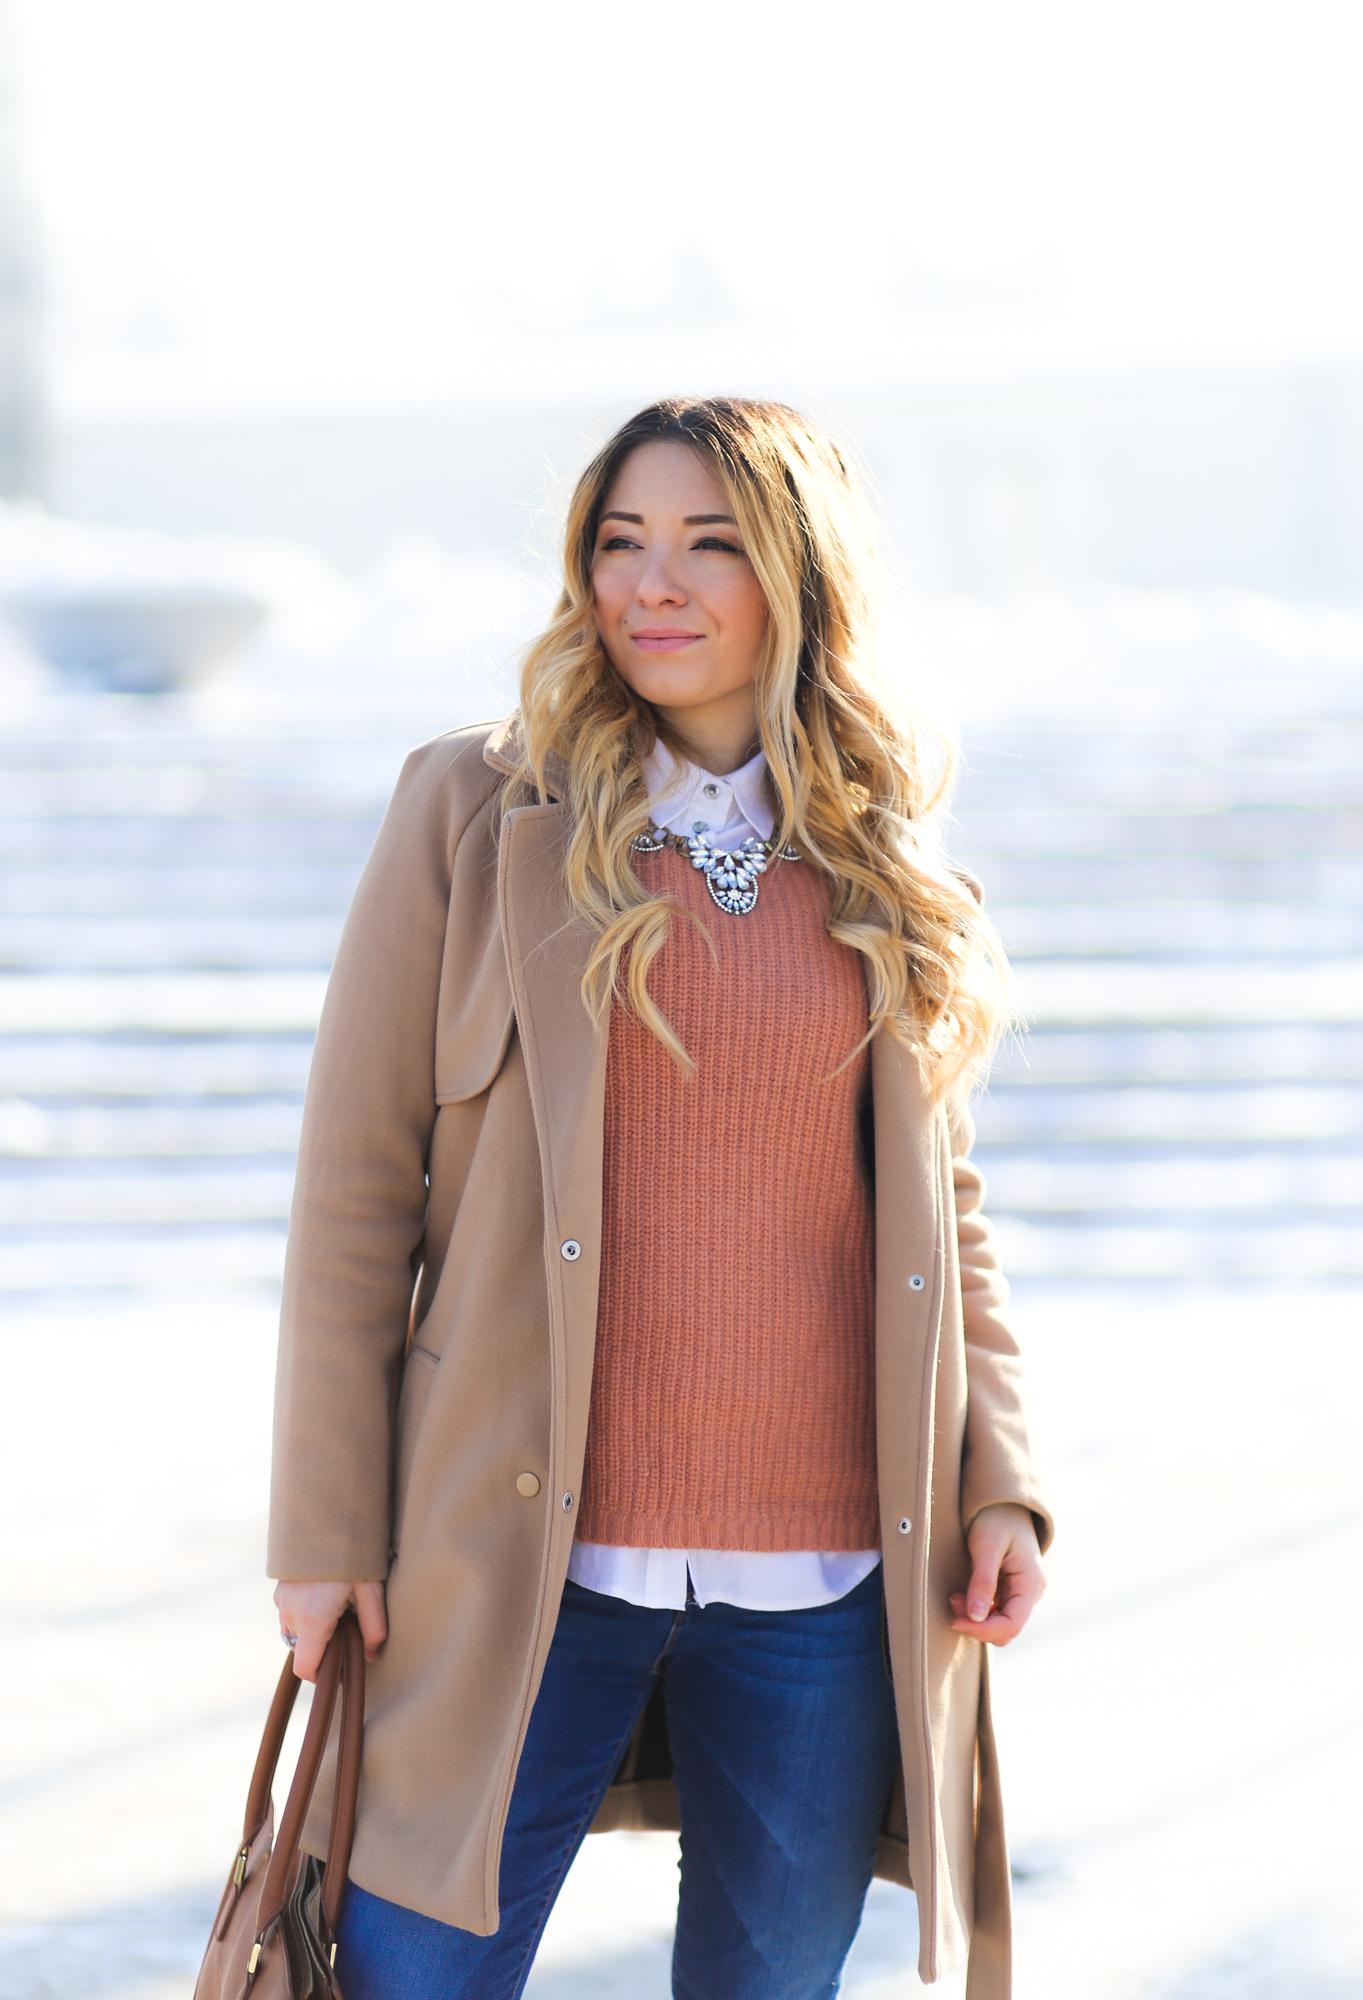 andreea ristea - blog de moda, de stil personal